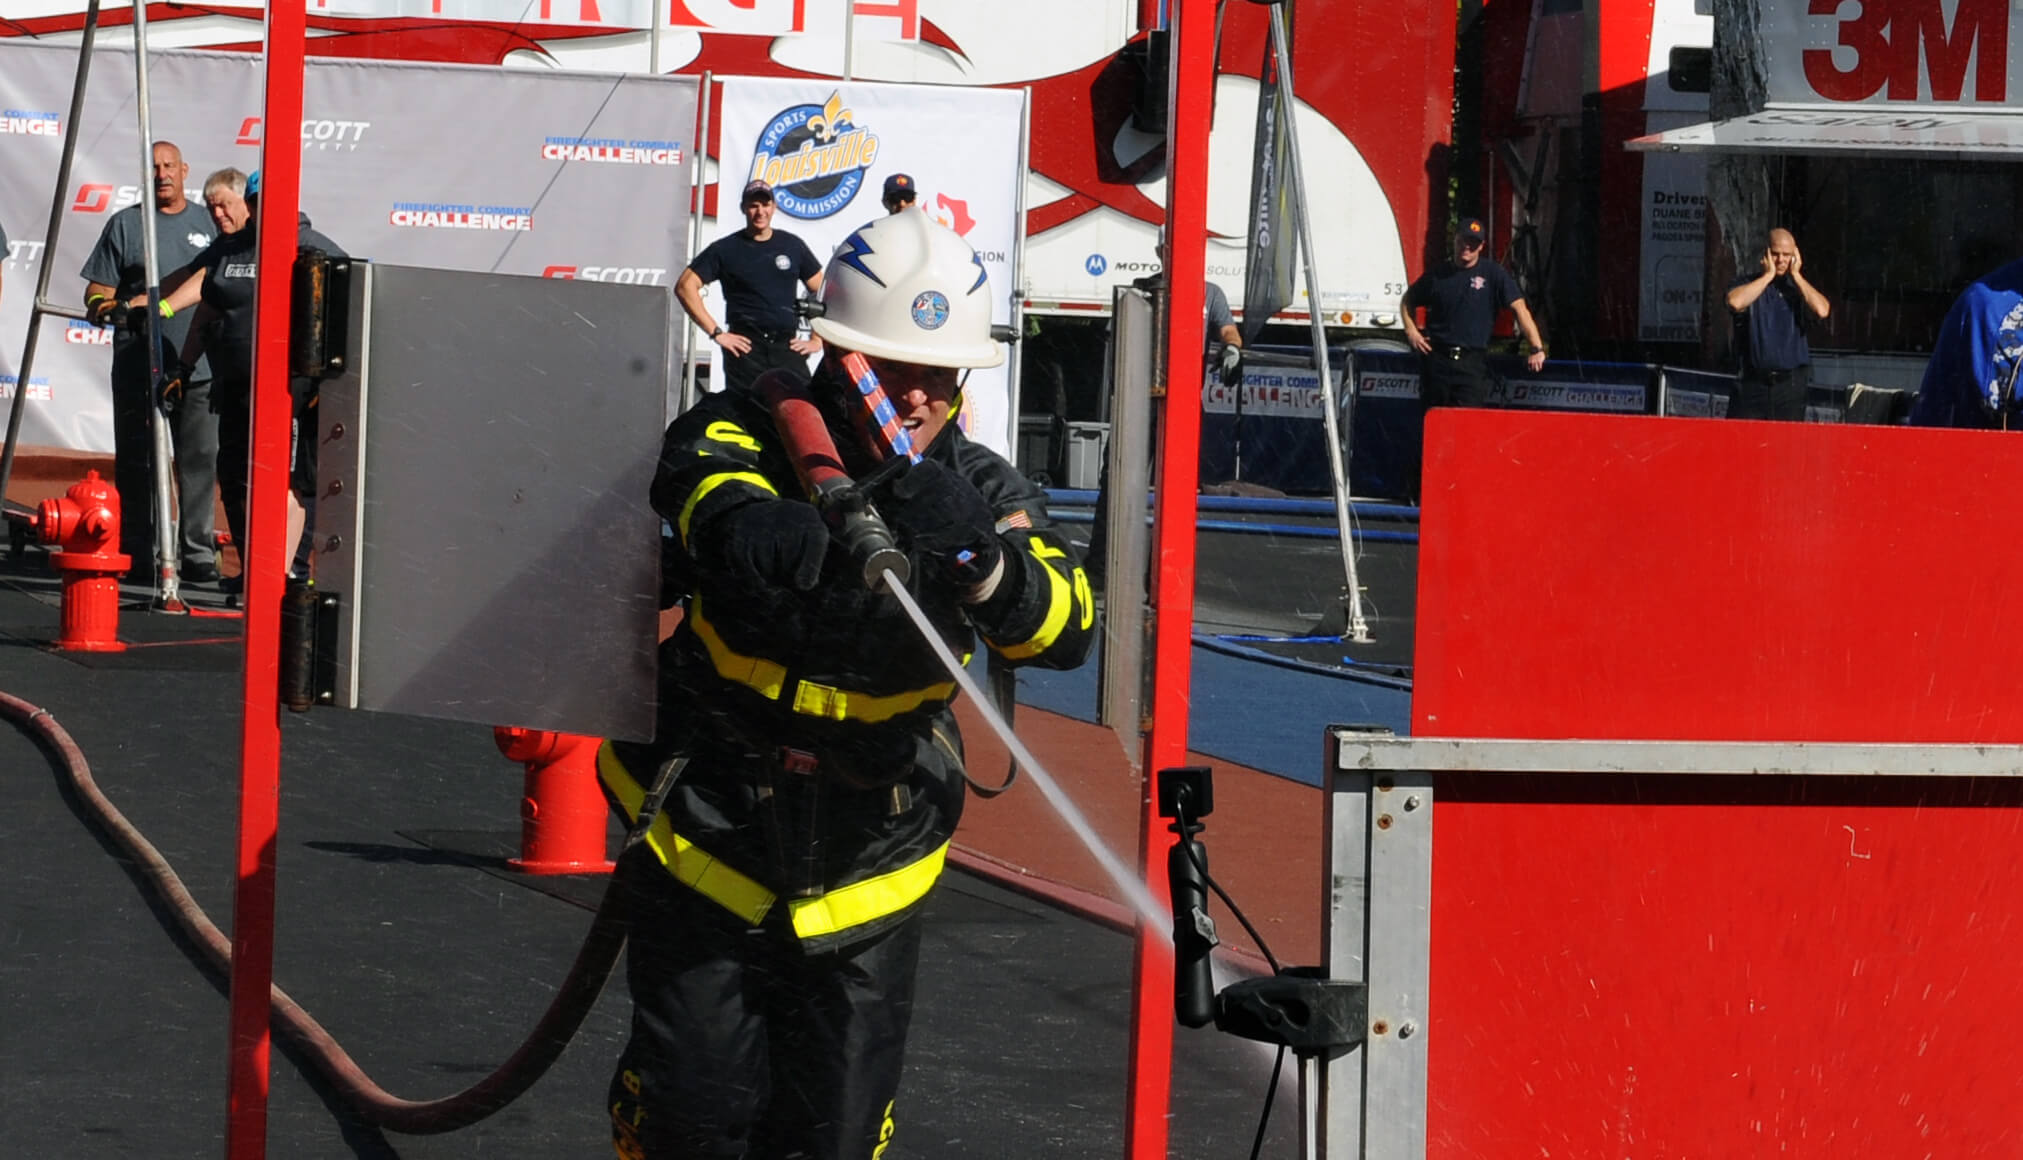 Firefighter Challenge 2017